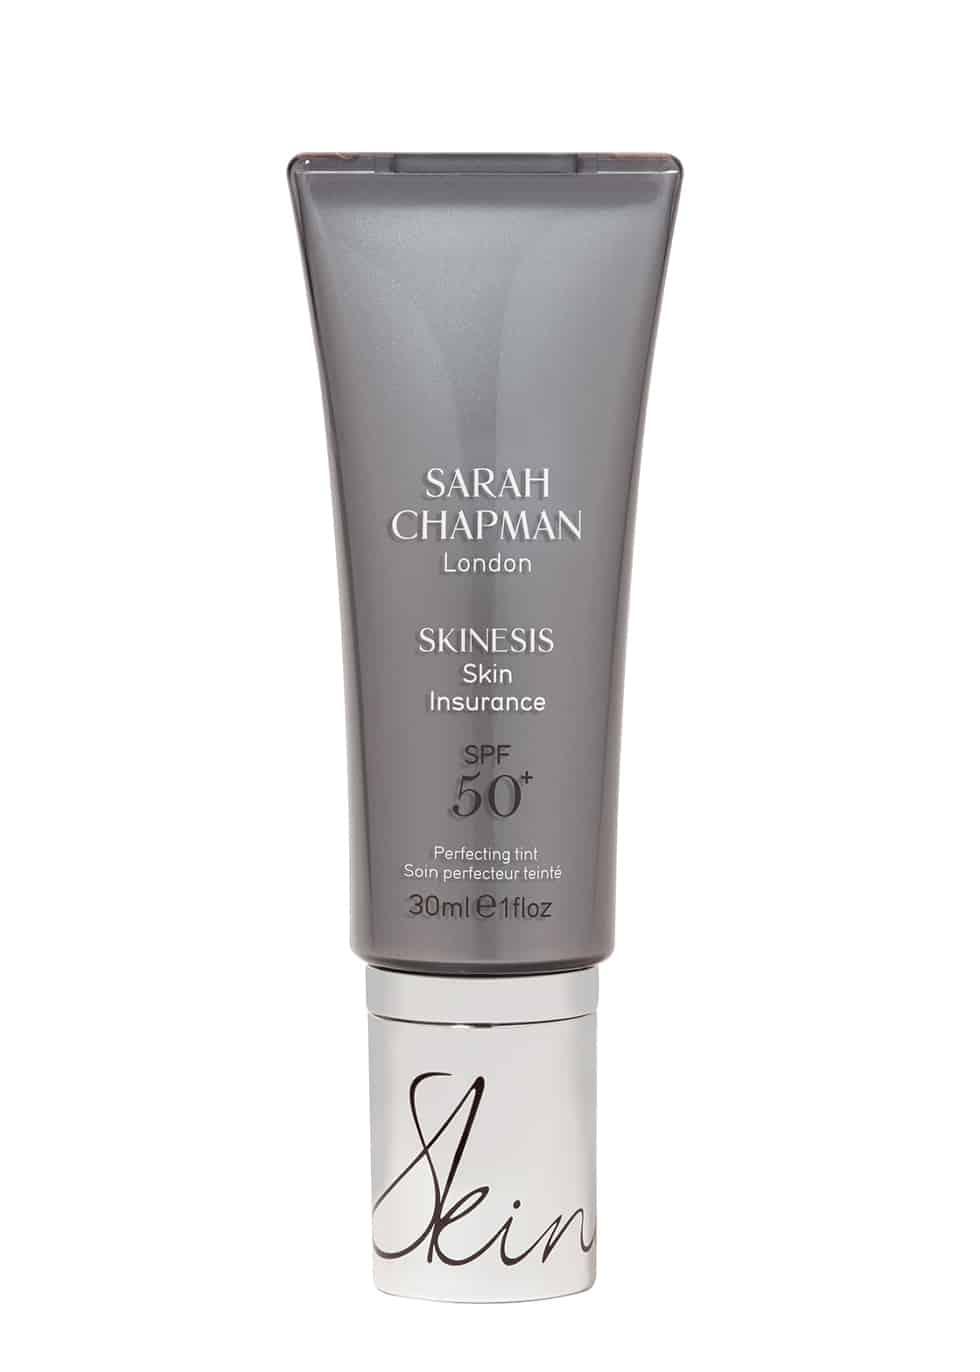 Sarah Chapman Skinesis Skin Insurance Perfecting Tint SPF50